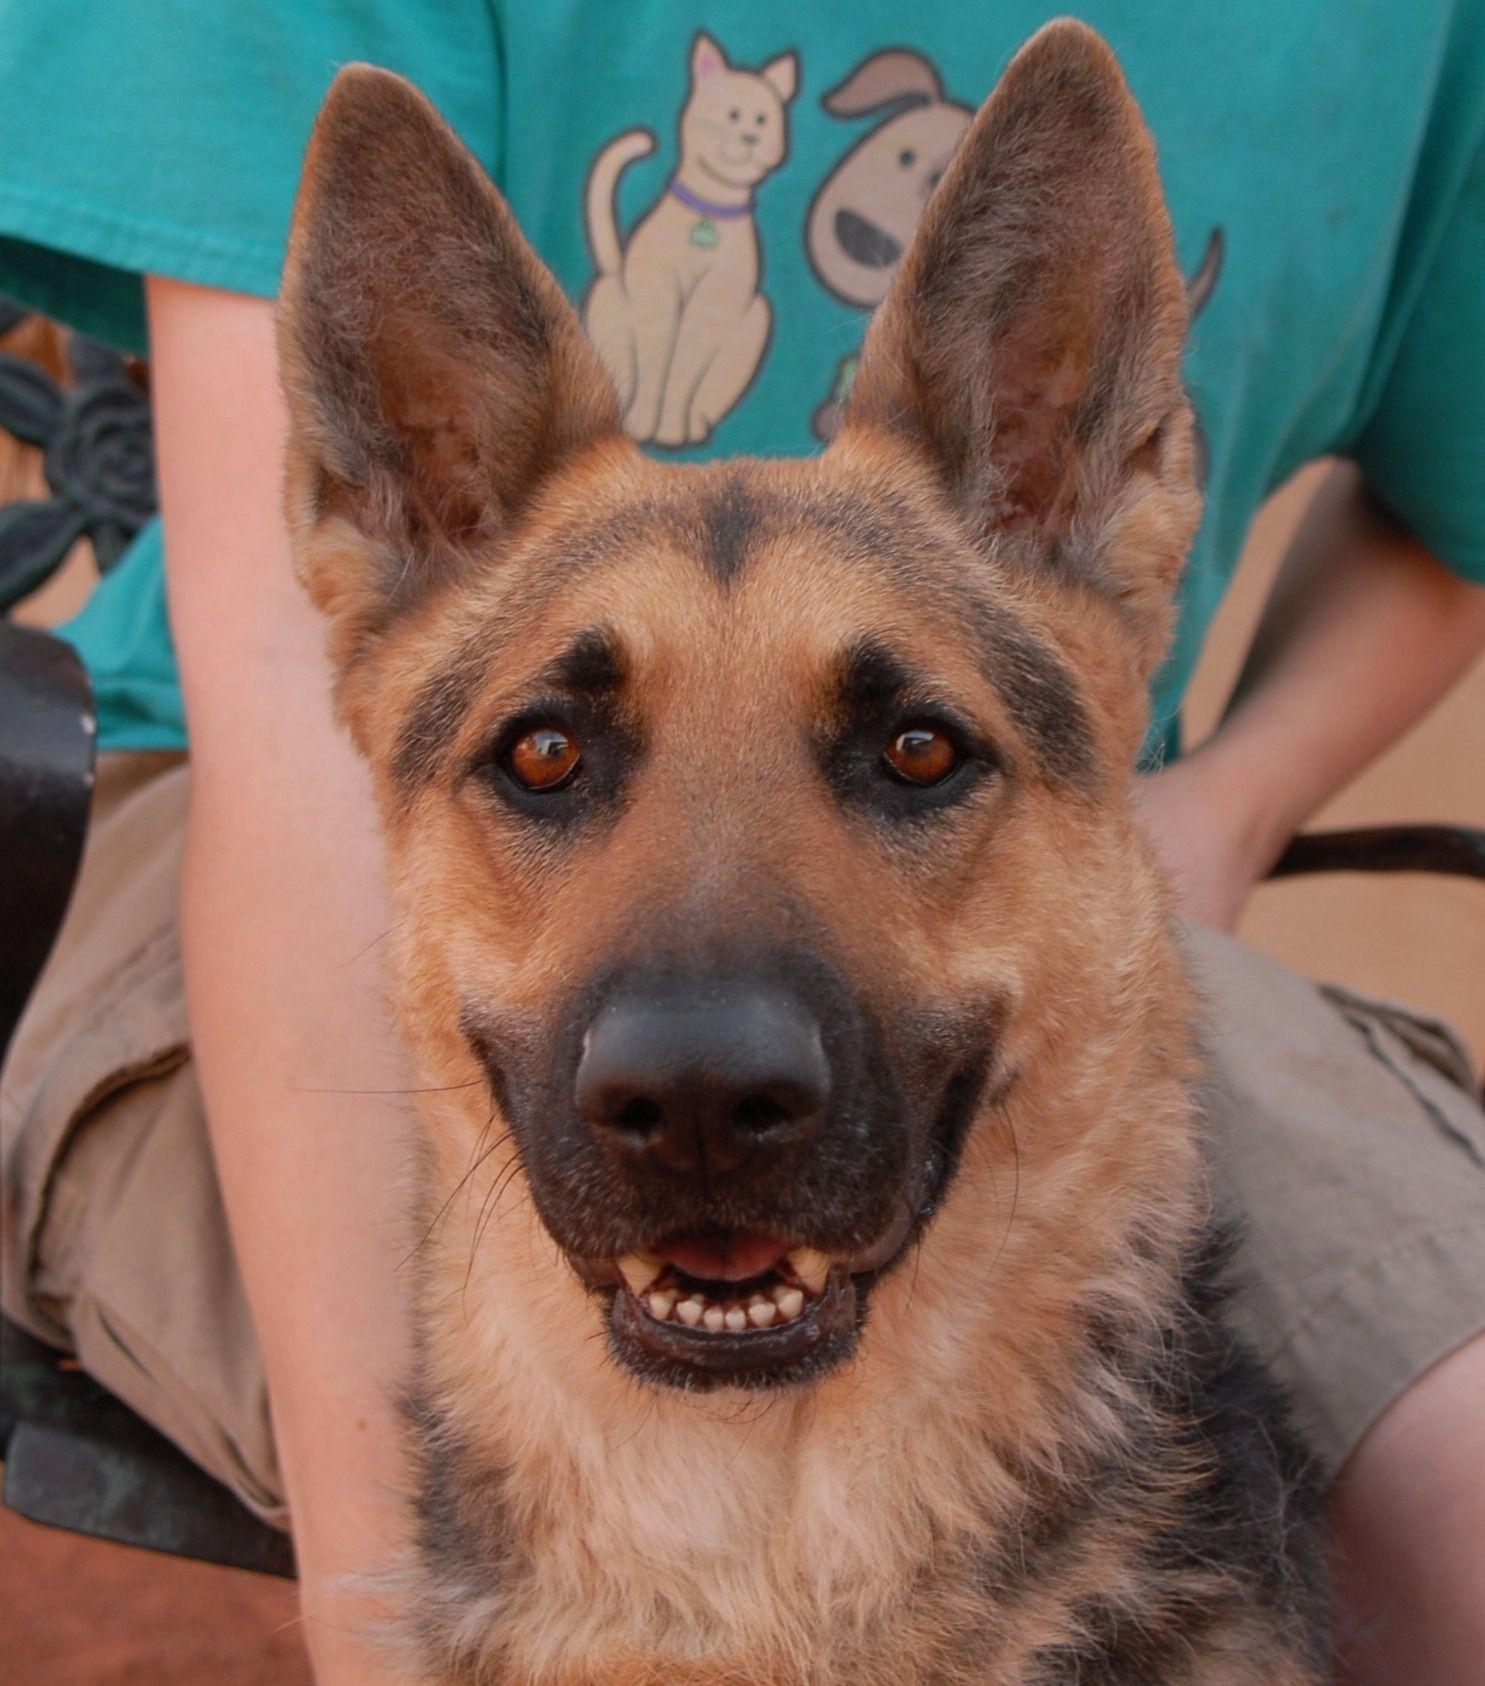 Dawn is a radiant german shepherd debuting for adoption